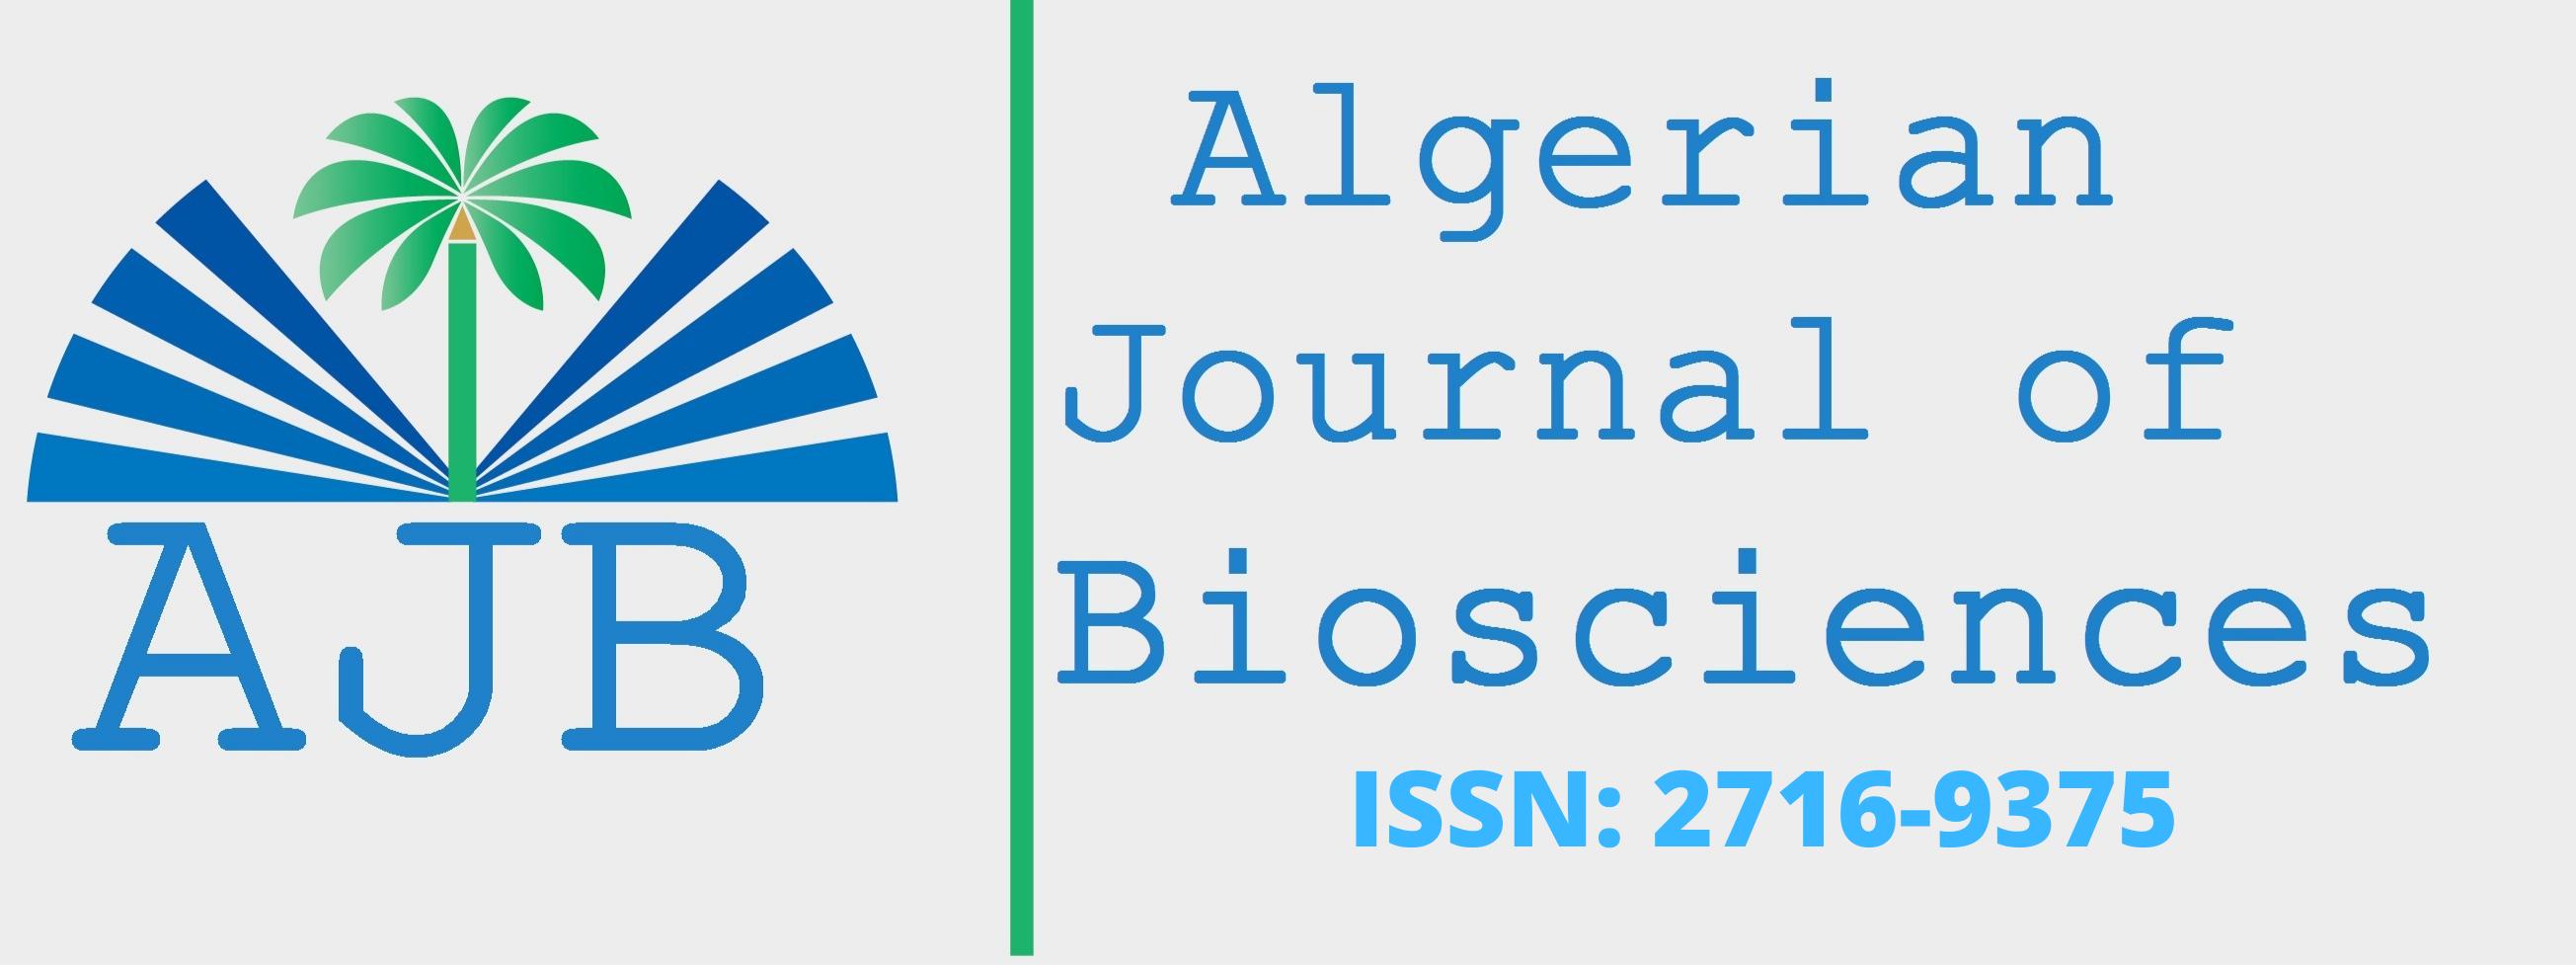 ALGERIAN JOURNAL OF BIOSCEINCES